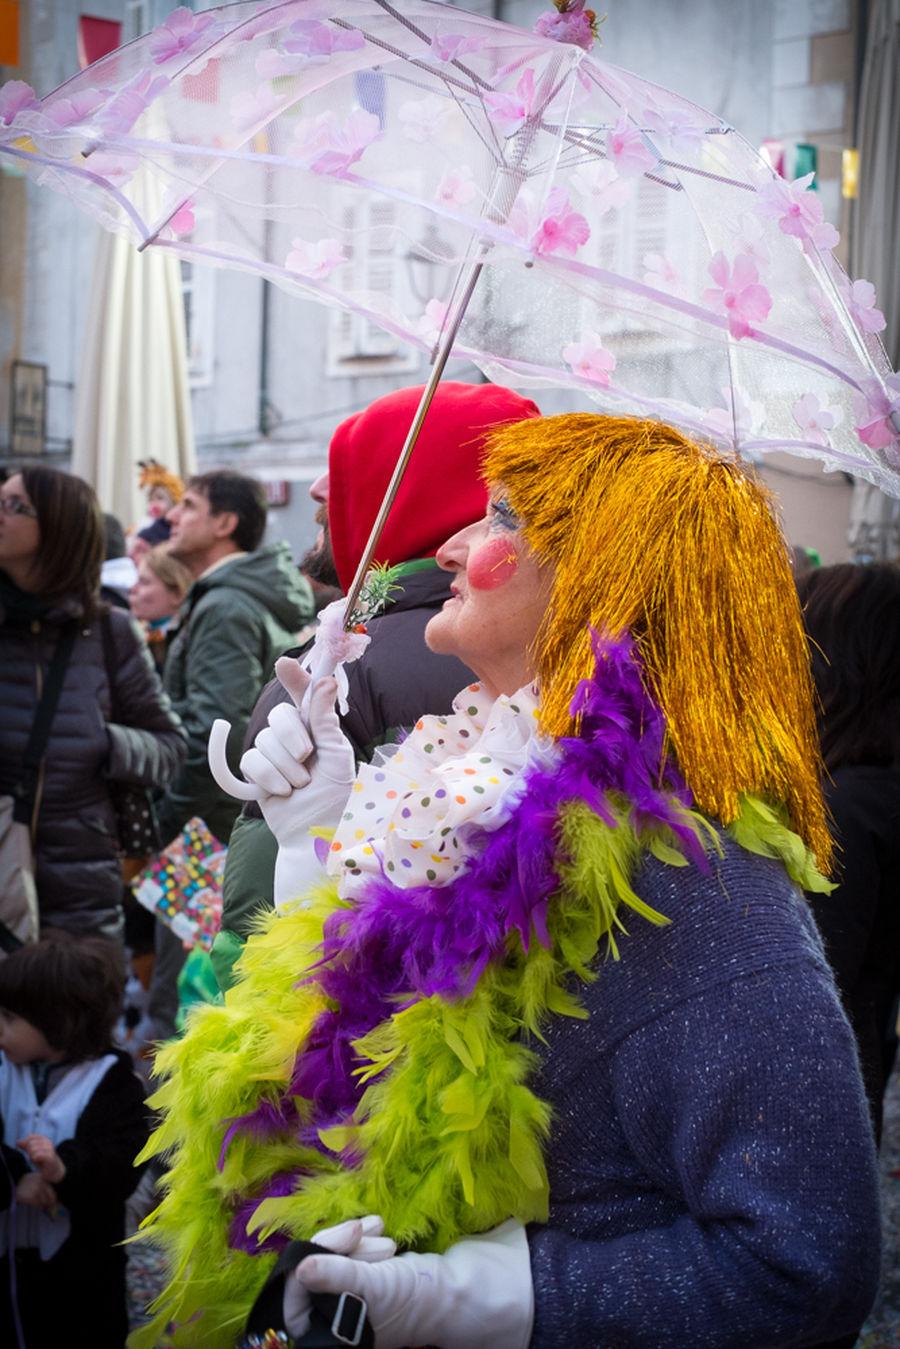 Carnevaldemuja63 Colours Of Carnival Discovertrieste Lampgrafic@gmail.com Carnevale TriesteSocial Muggialive Livemuja Showcase: February ComunediMuggia Discovermuggia Xe1 Trieste Muggia Friuliveneziagiulia Carneval Livemuggia Creativity Showcase:february Colours Colours Of Carnival Colors Of Carnival